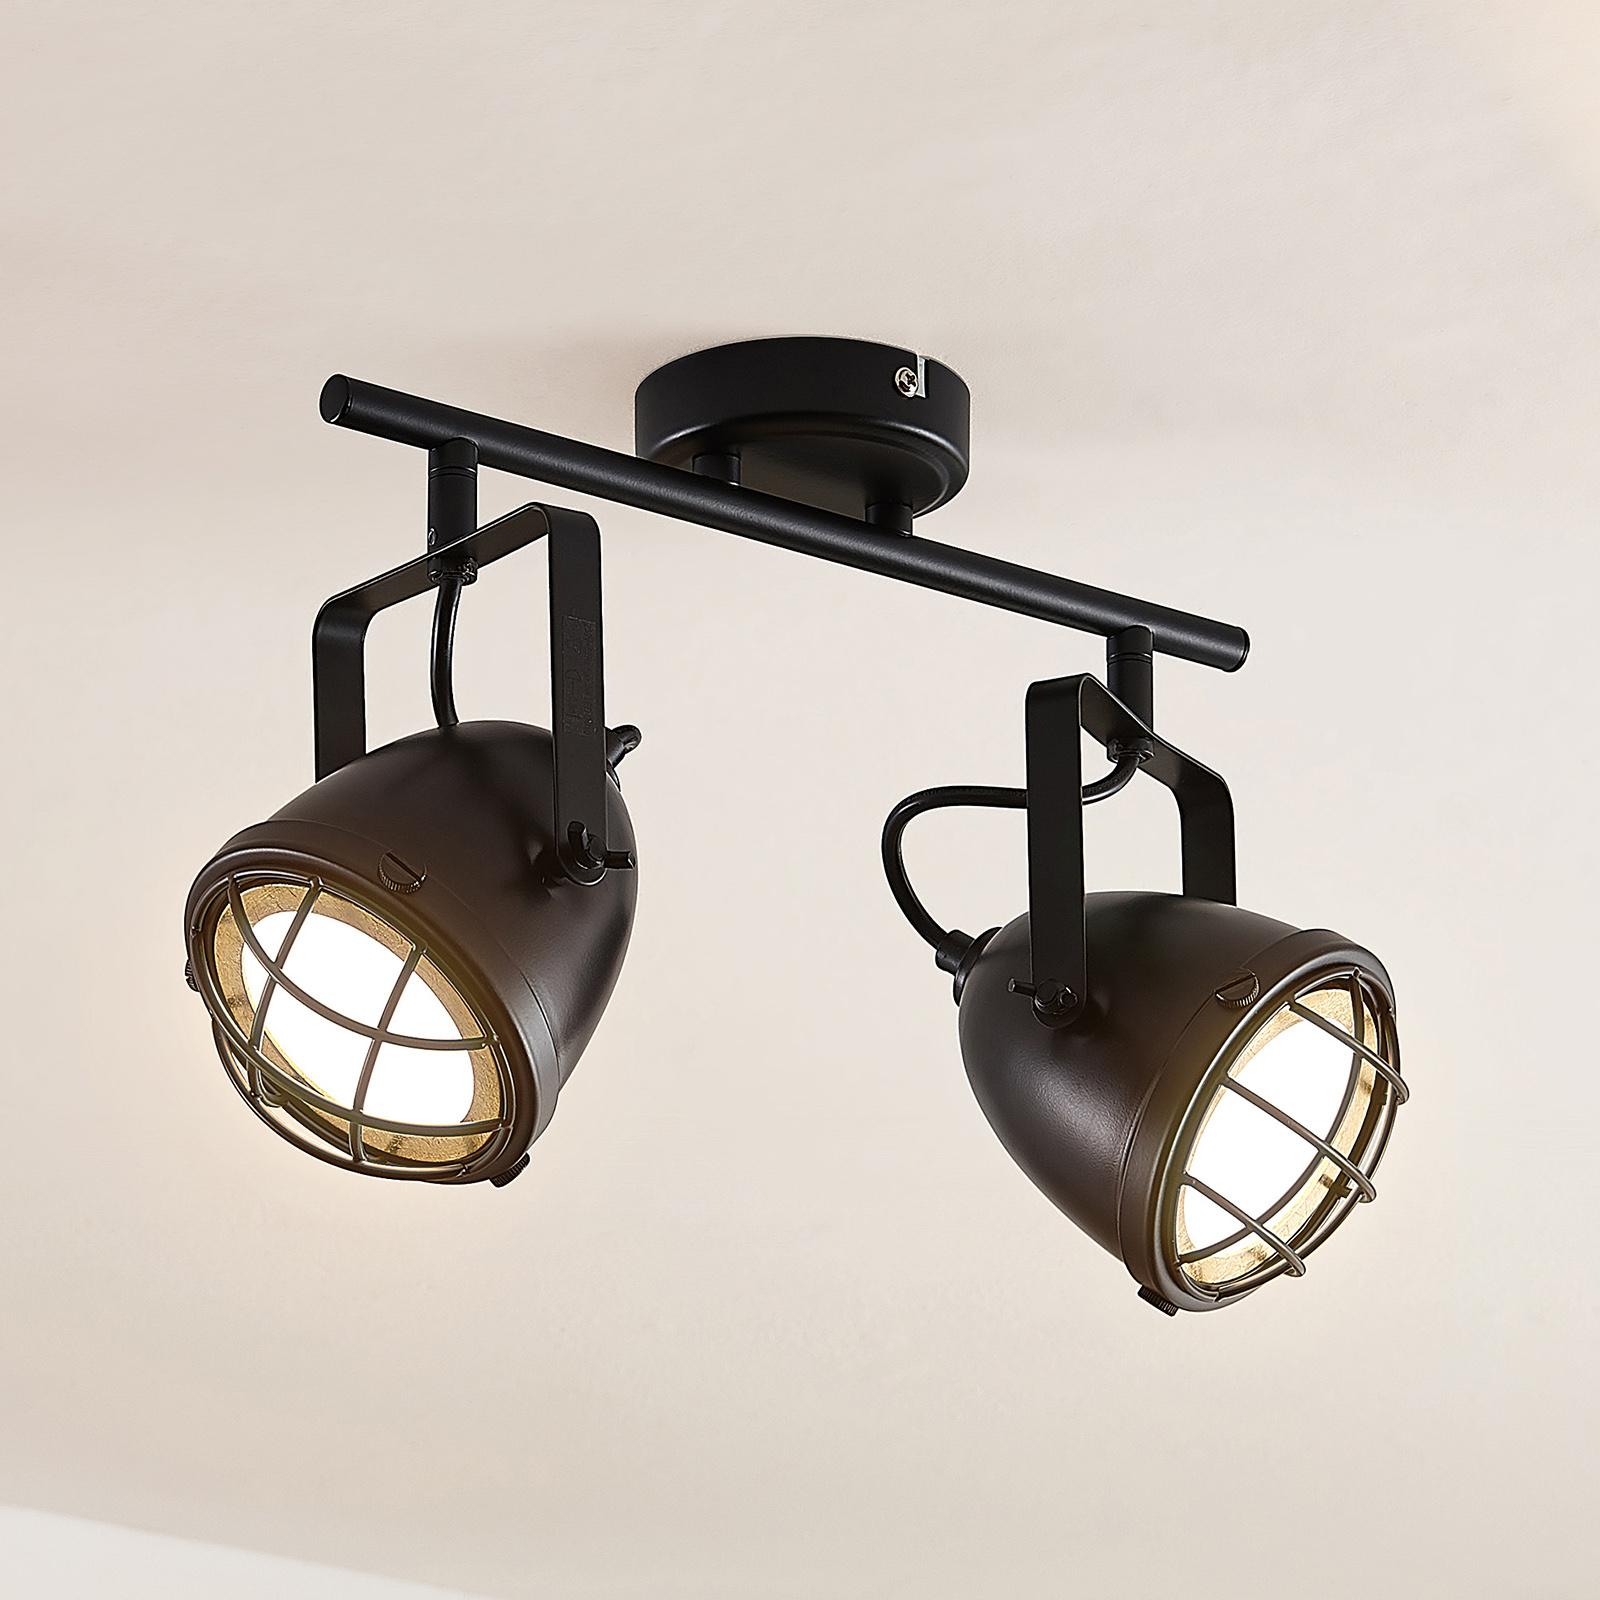 Lindby Biona LED-takspot med gullring, 2 lyskilder